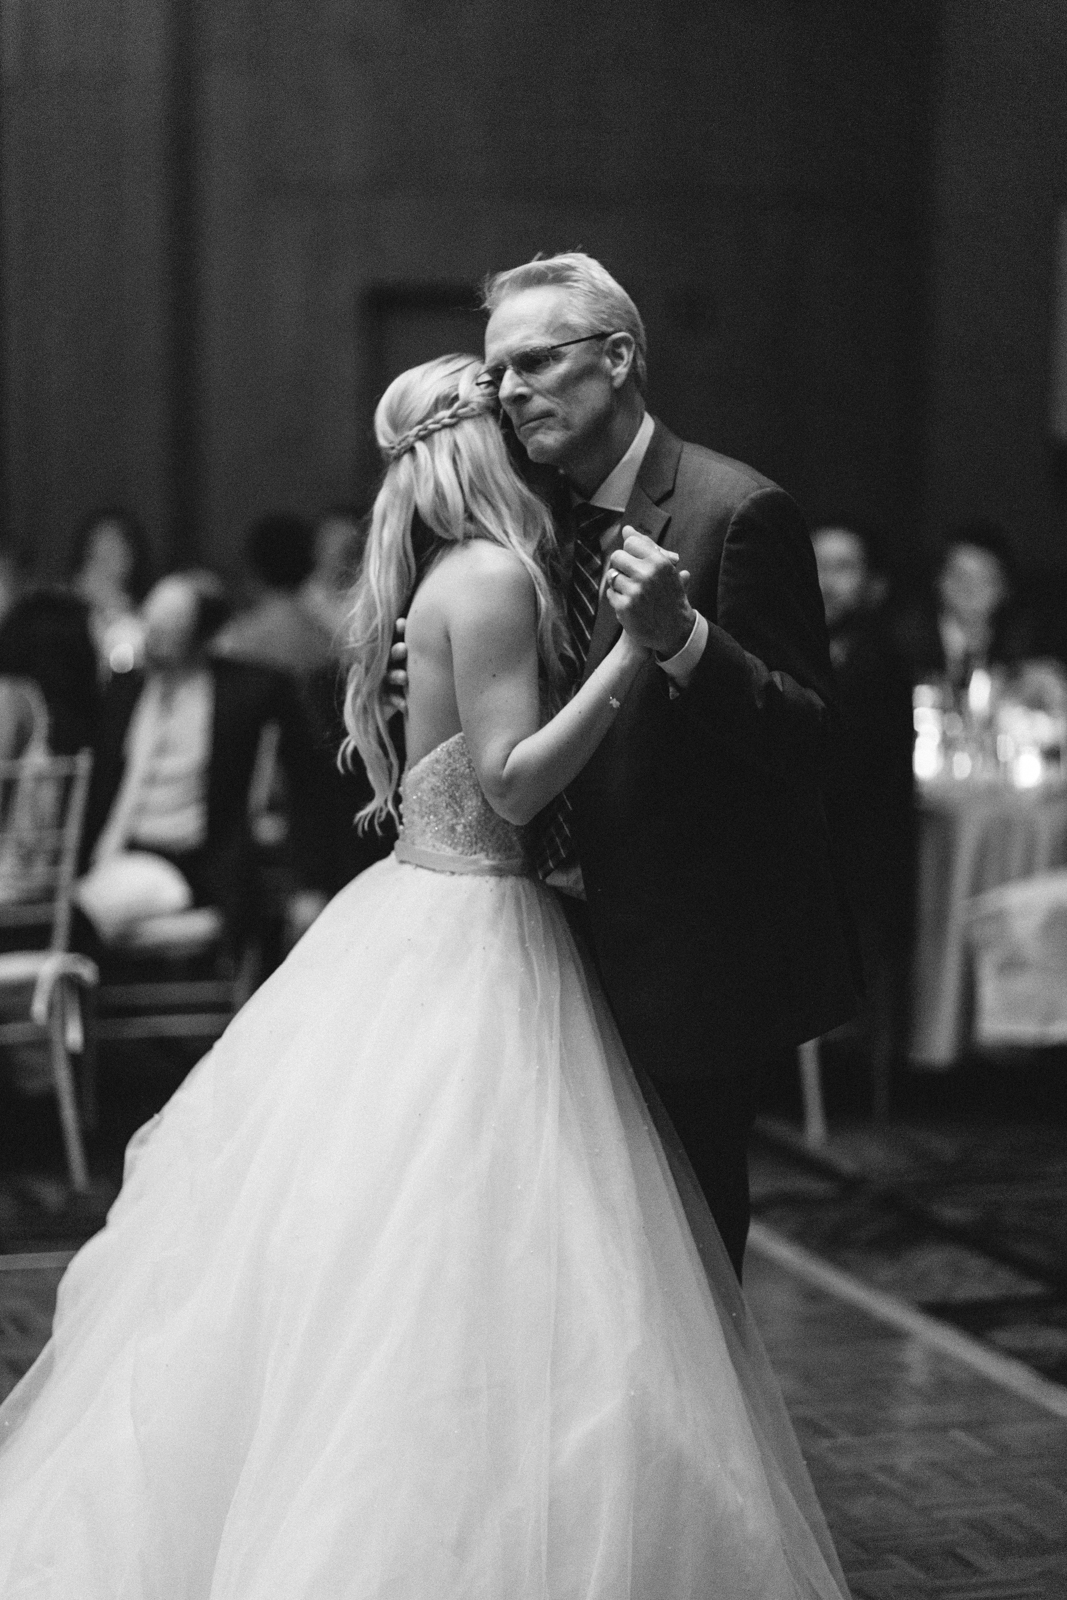 NYC Wedding Photography Sofitel Central Park Brooklyn Photographer Boris Zaretsky _B2C3353.jpg